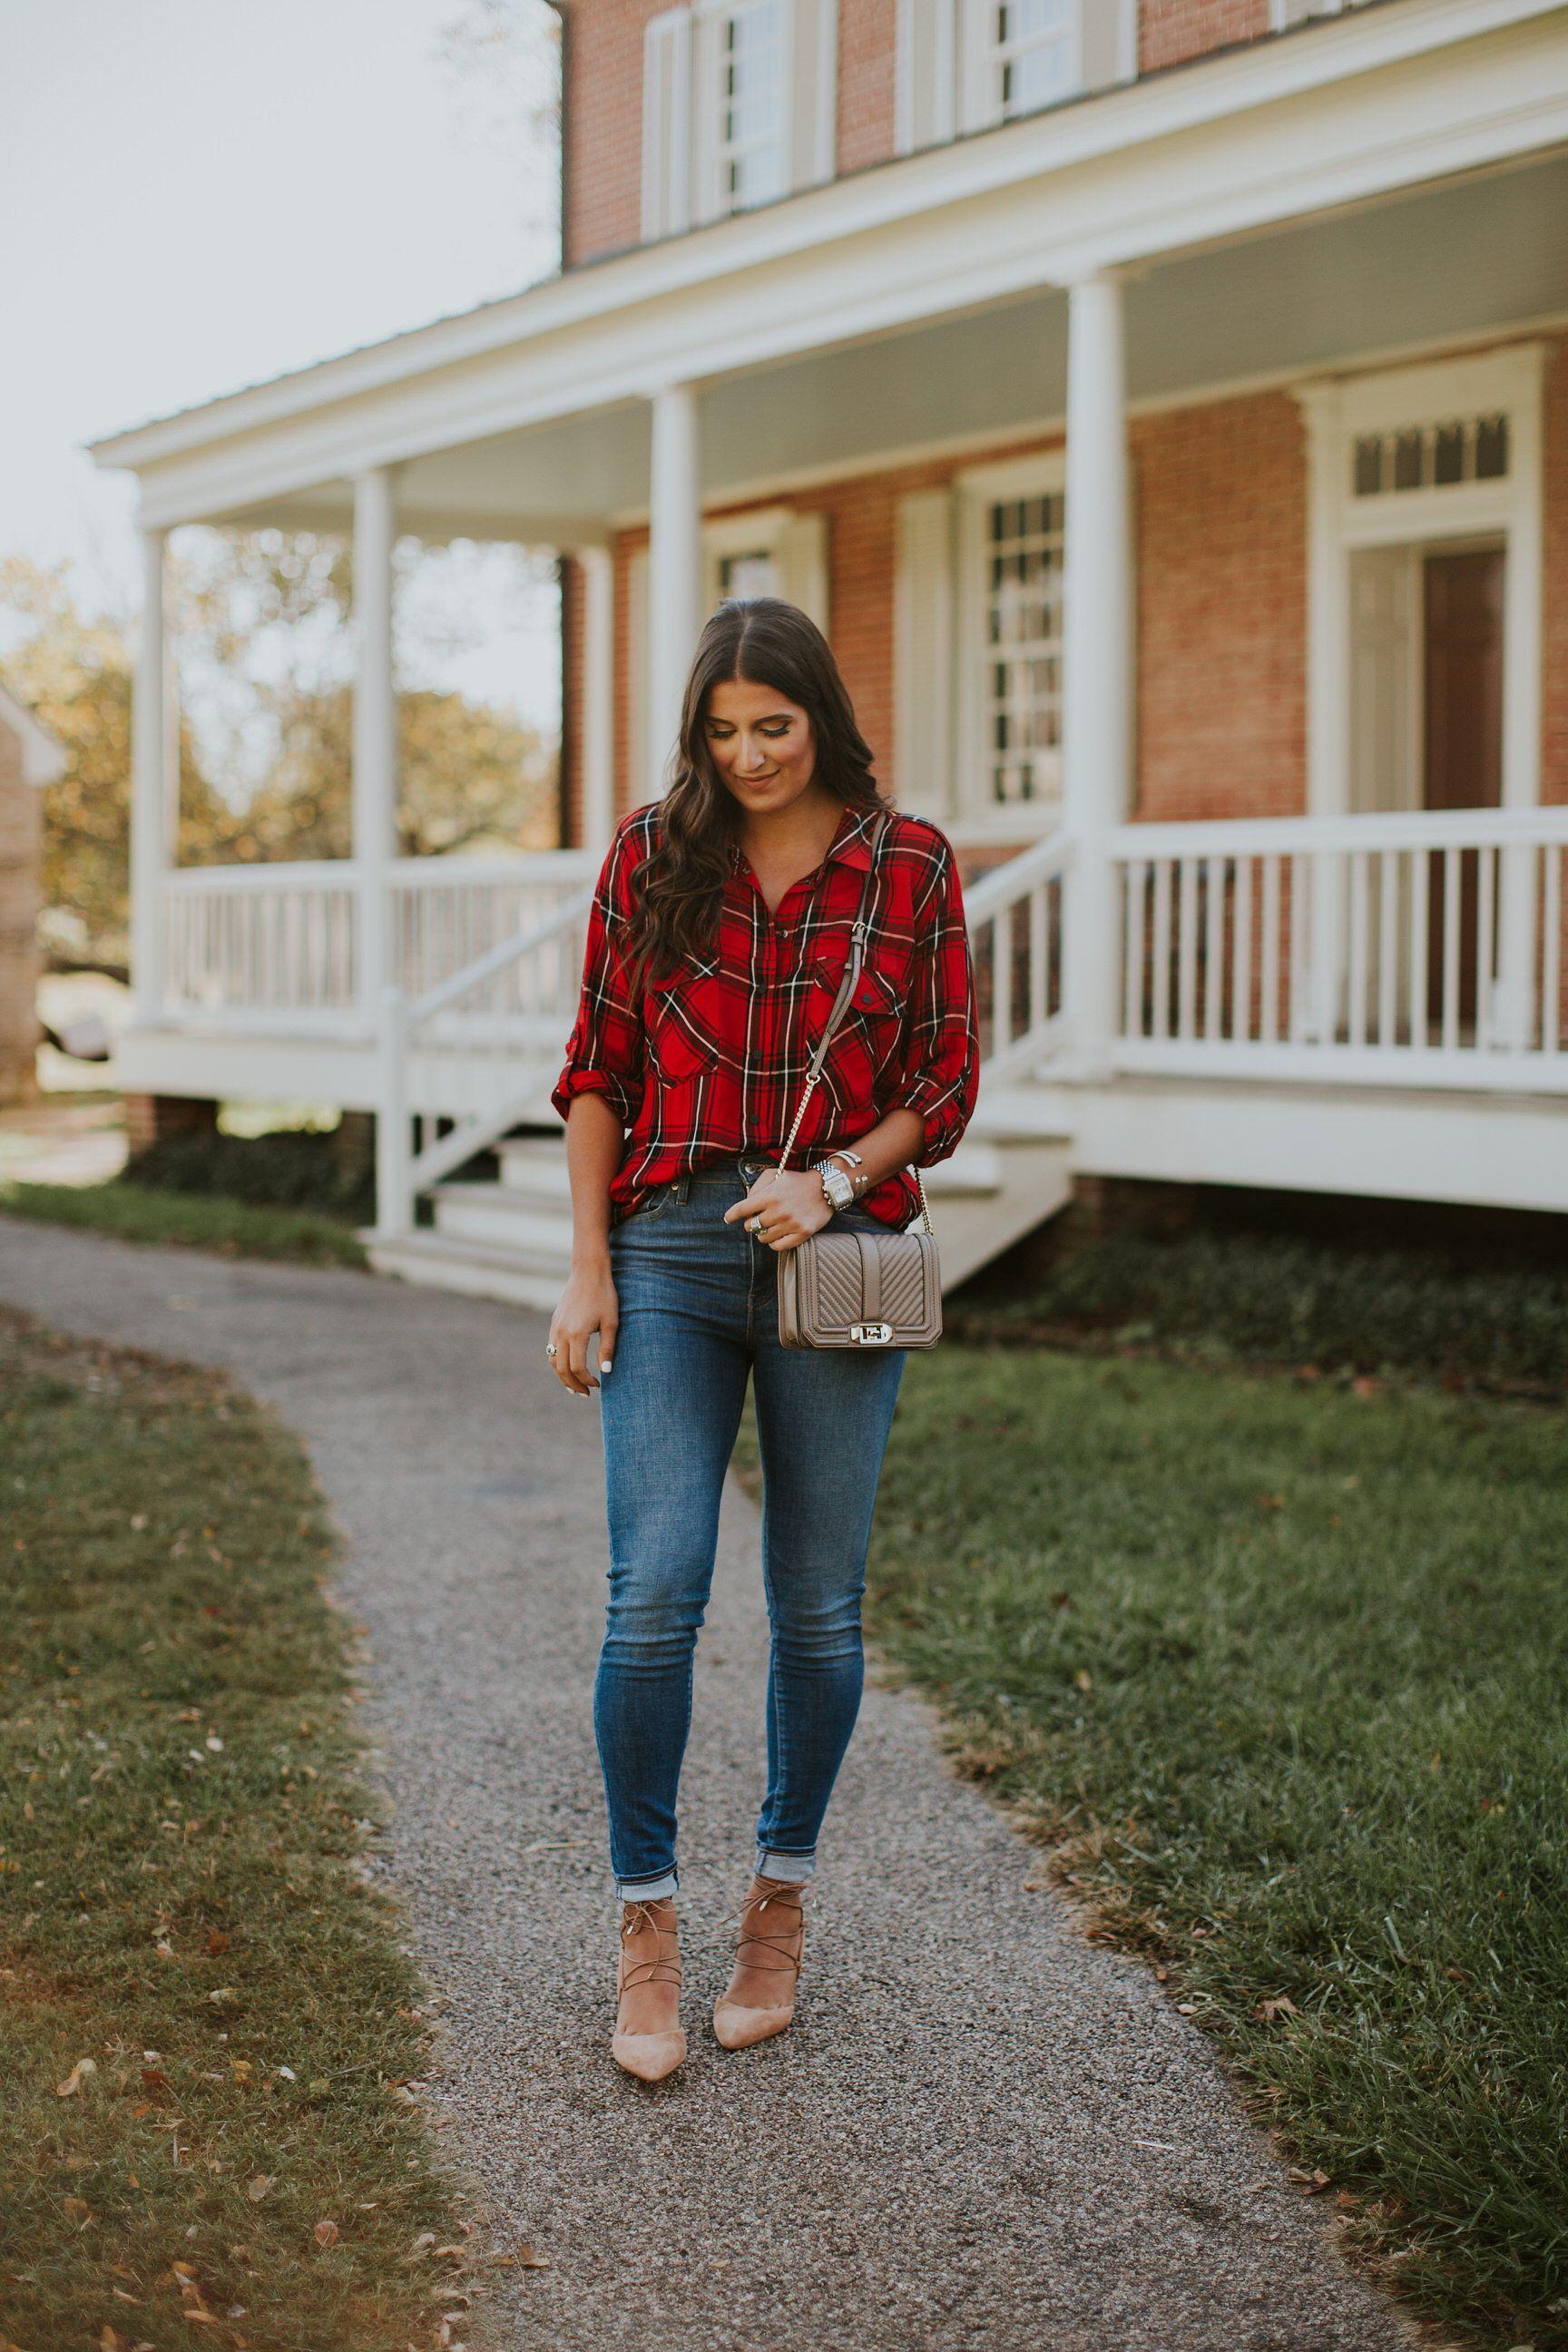 Dress up flannel shirt  Holiday Plaid Shirt  Red plaid Skinny jeans and Plaid